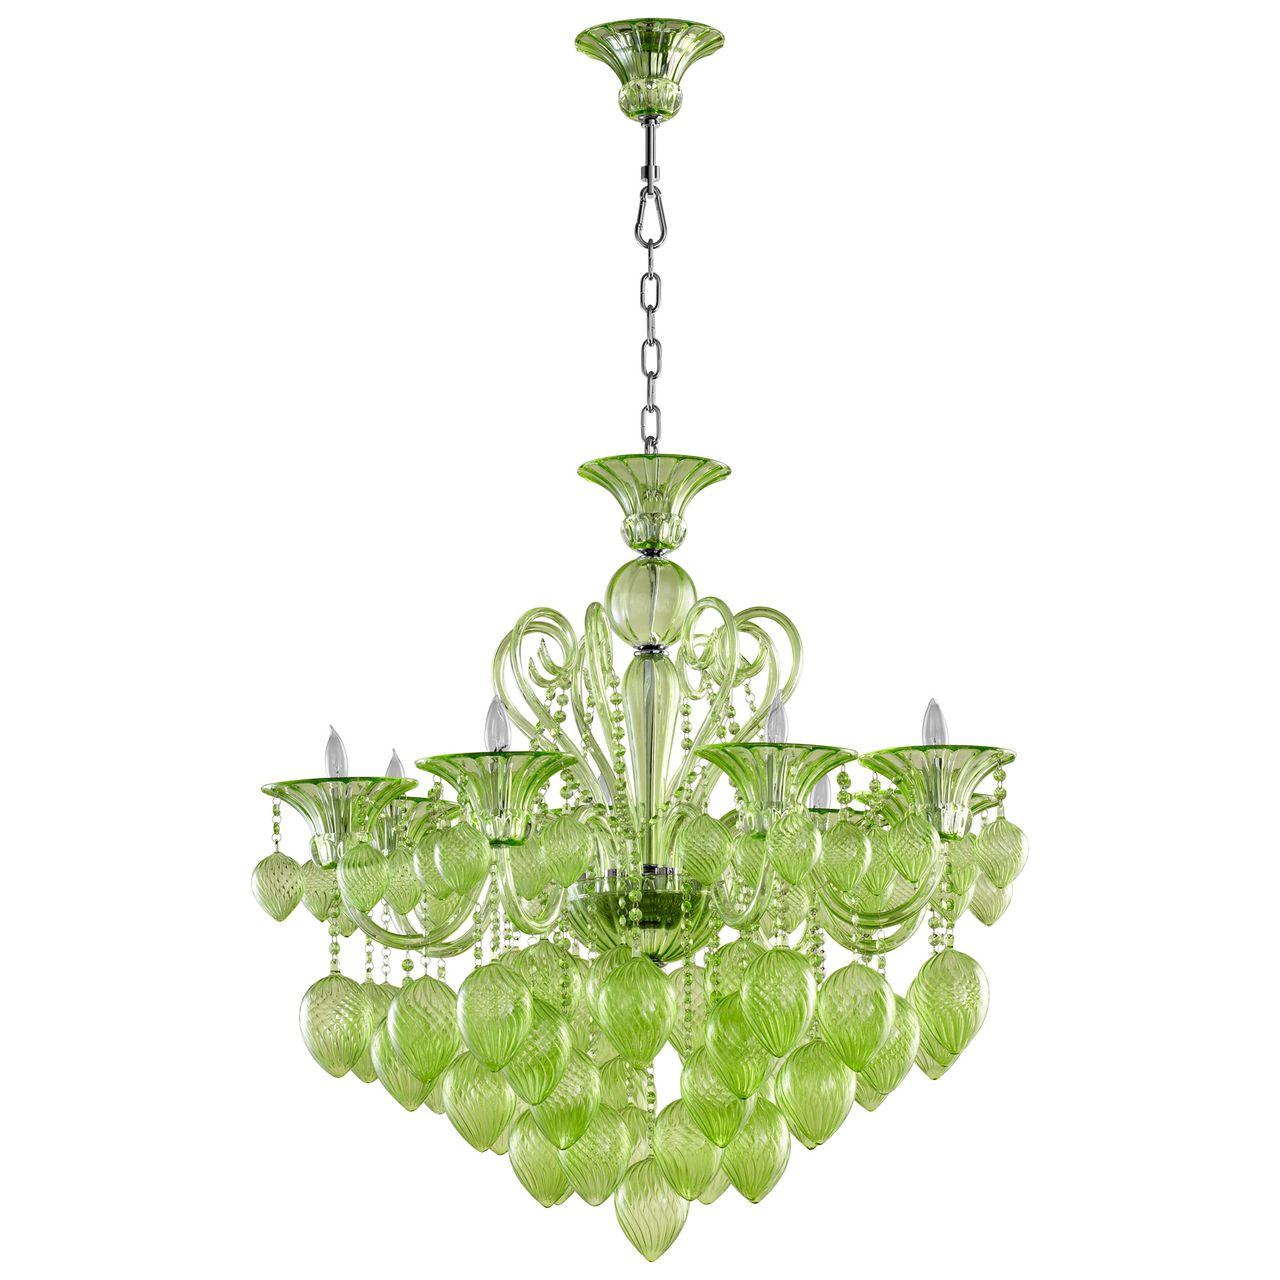 Bella vetro 8 light green chandelier green murano style glass bella vetro 8 light green chandelier green murano style glass arubaitofo Choice Image